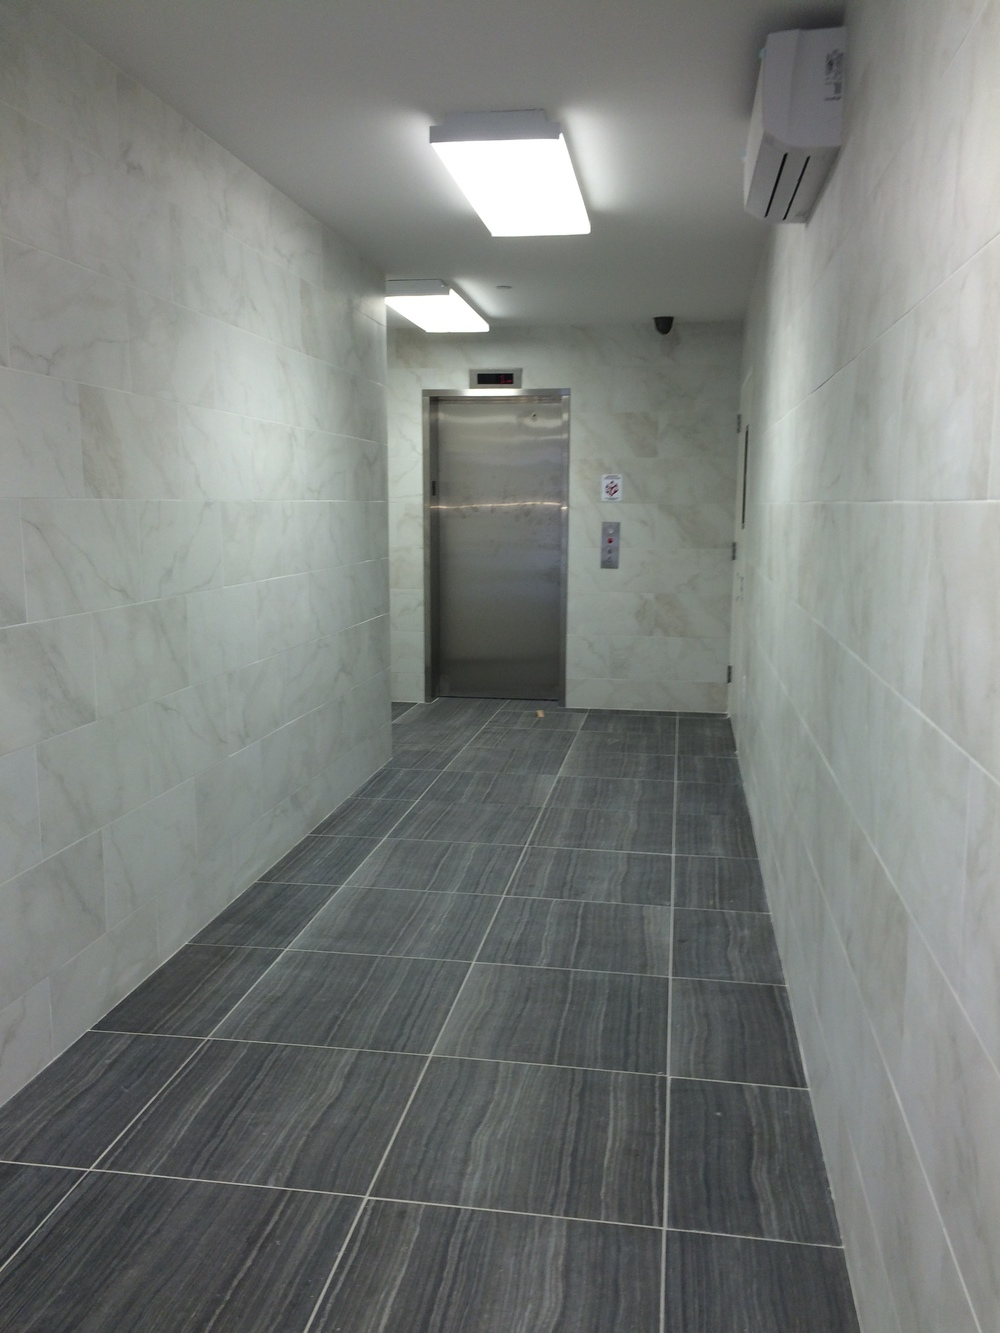 Left-side lobby on 1st floor